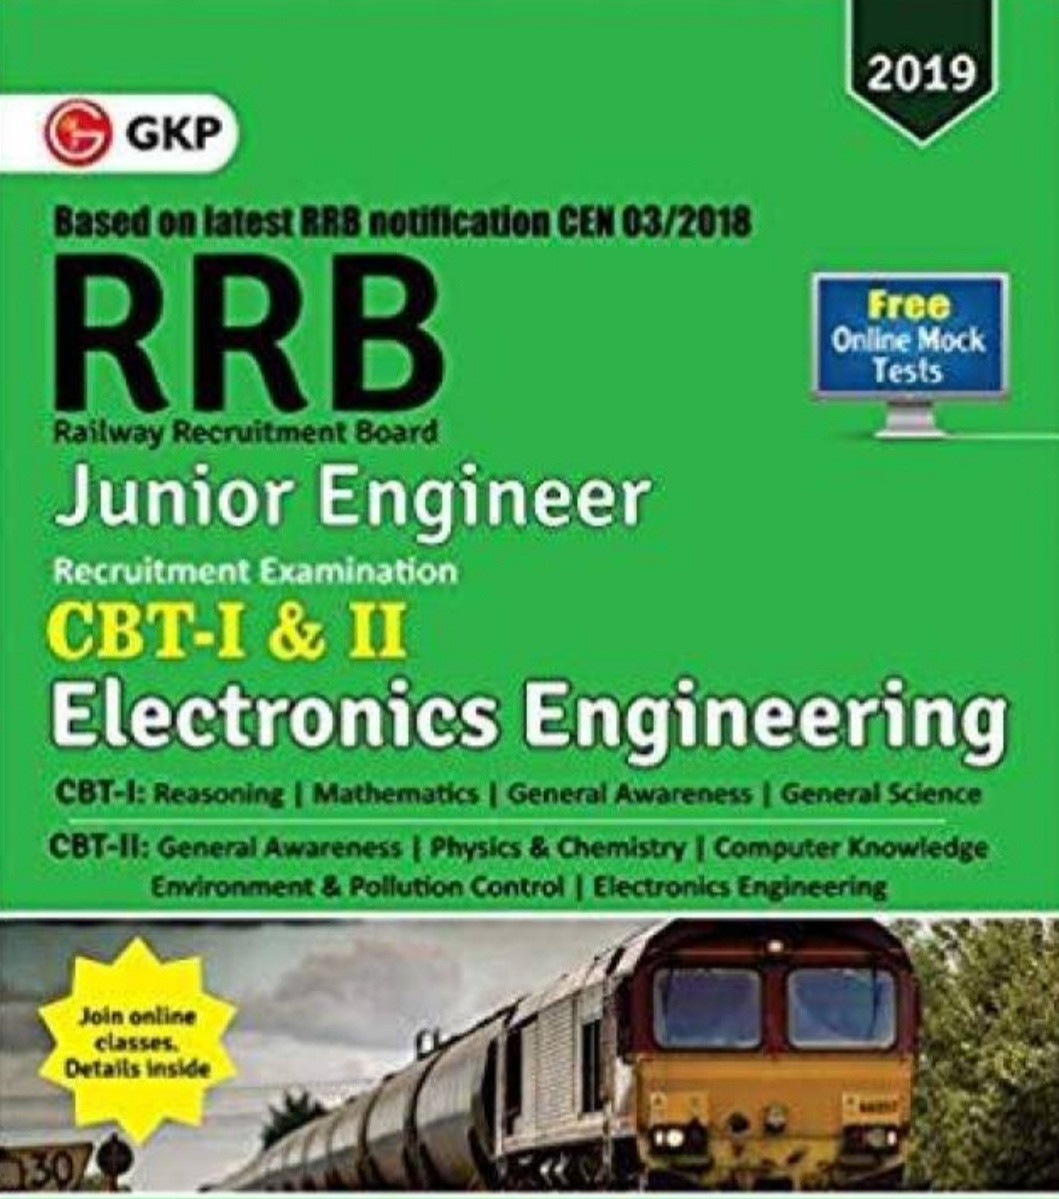 RRB – Railway Recruitment Board 2019 – Junior Engineering (CBT I & II)  ELECTRONICS ENGINEERING